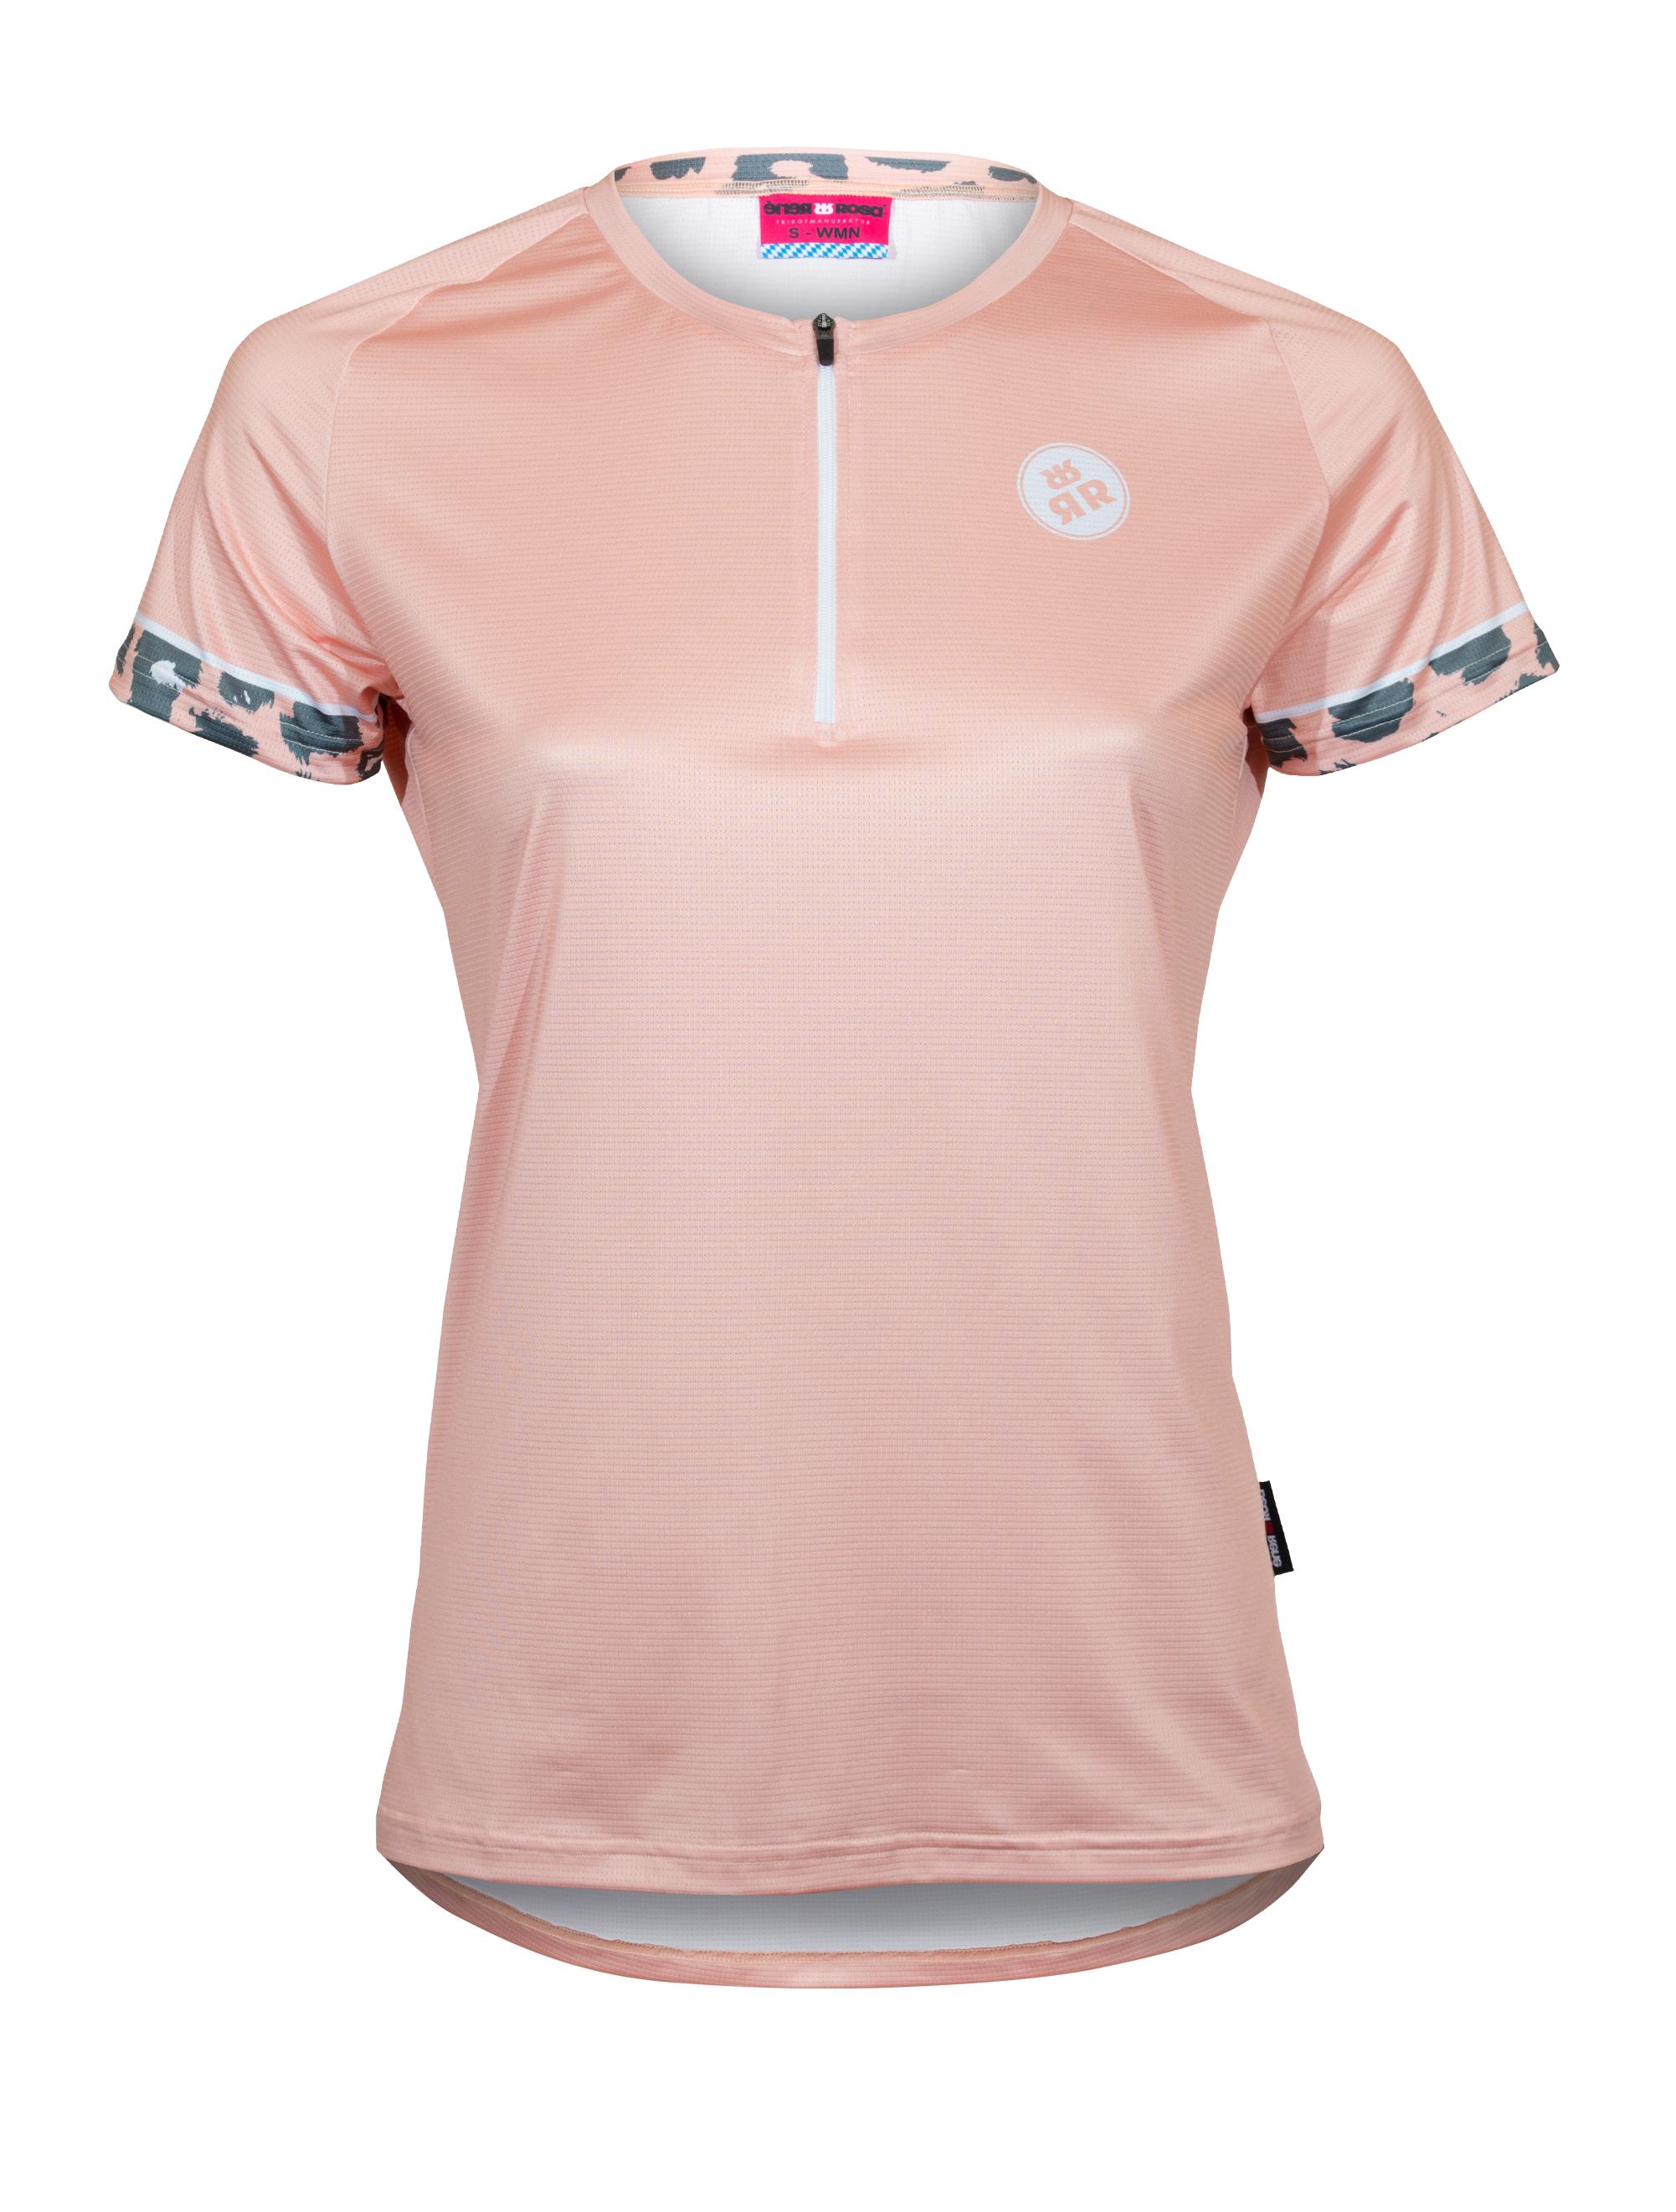 E-Bike Shirt RRT805W Damen / Evi Peach